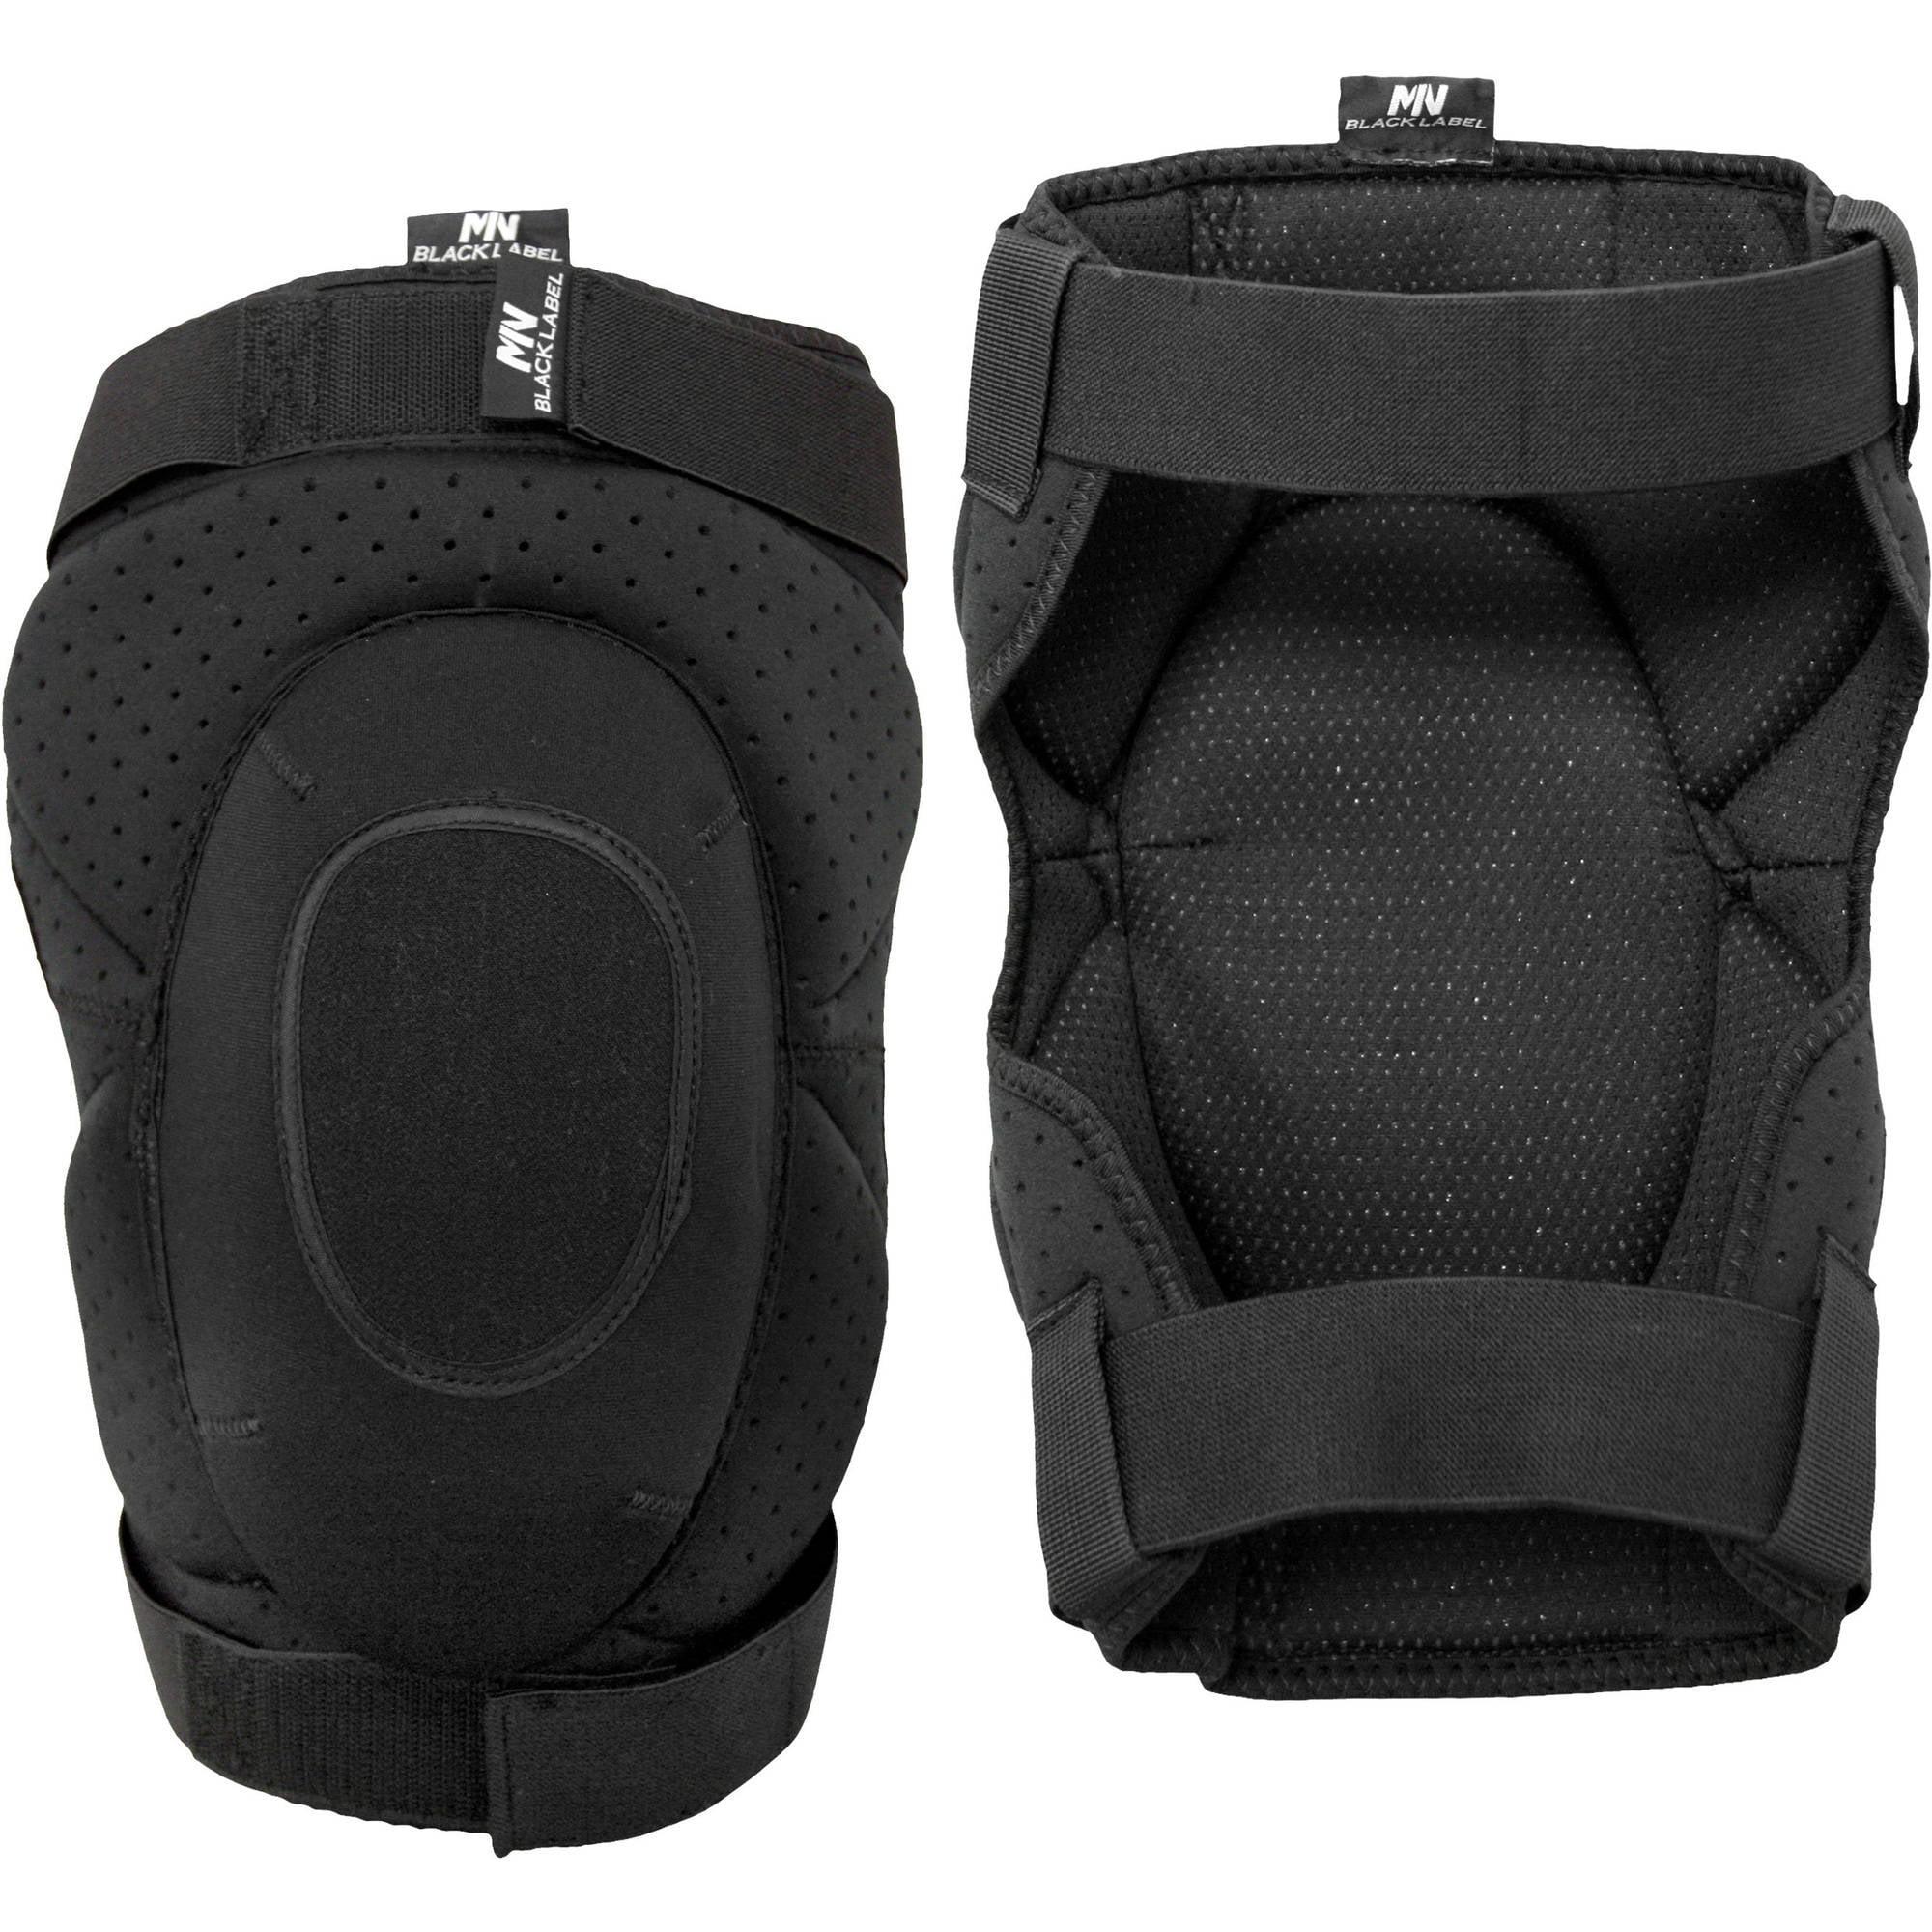 Rooster Products International McGuire-Nicholas Black Label Ortho Wrap Kneepads, 1BL-22410, Black